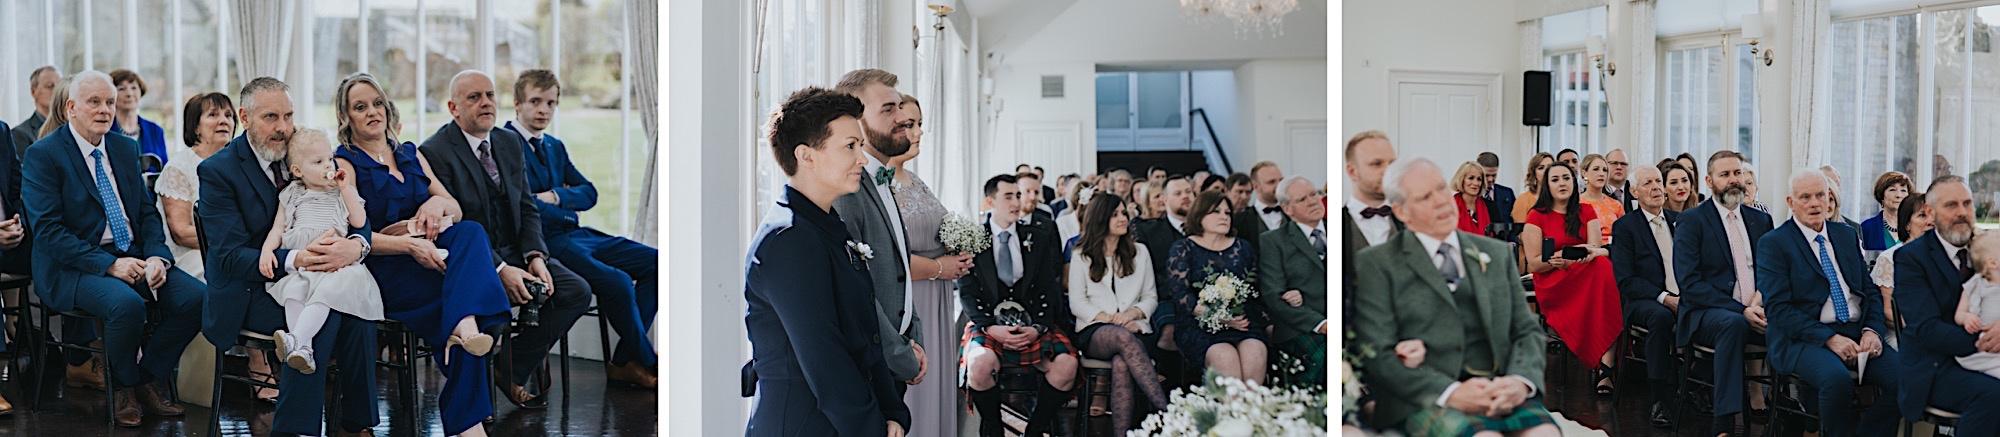 edinvurgh same sex lgbtq wedding photographer